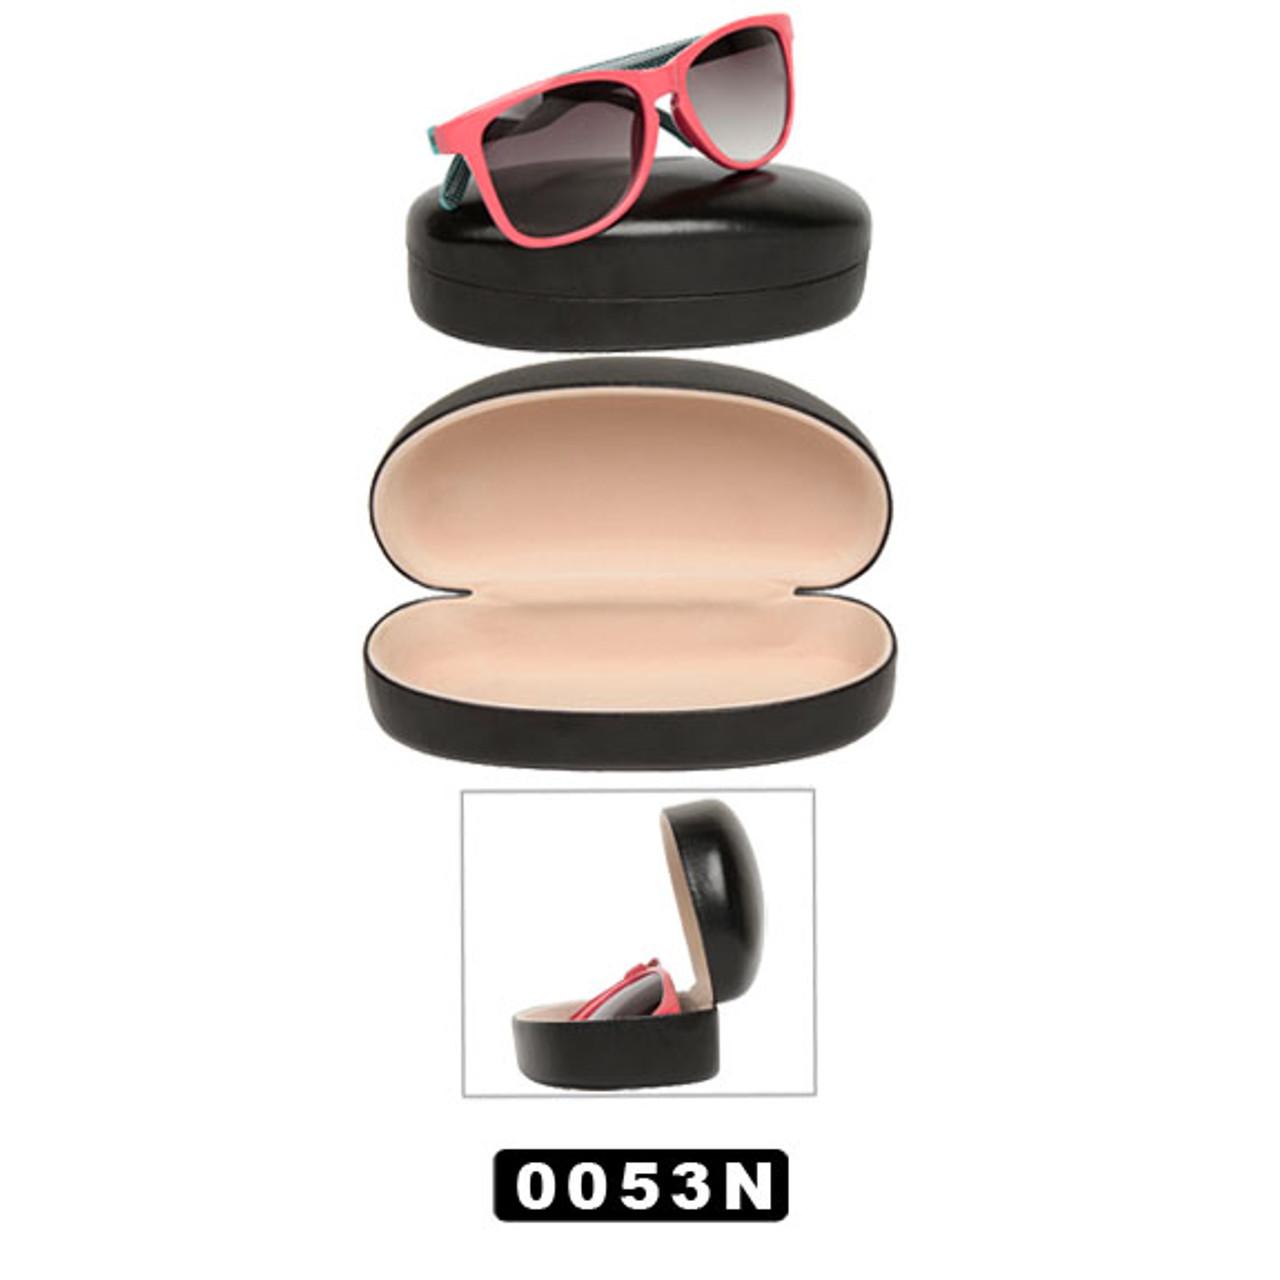 Sunglasses Case 0053N